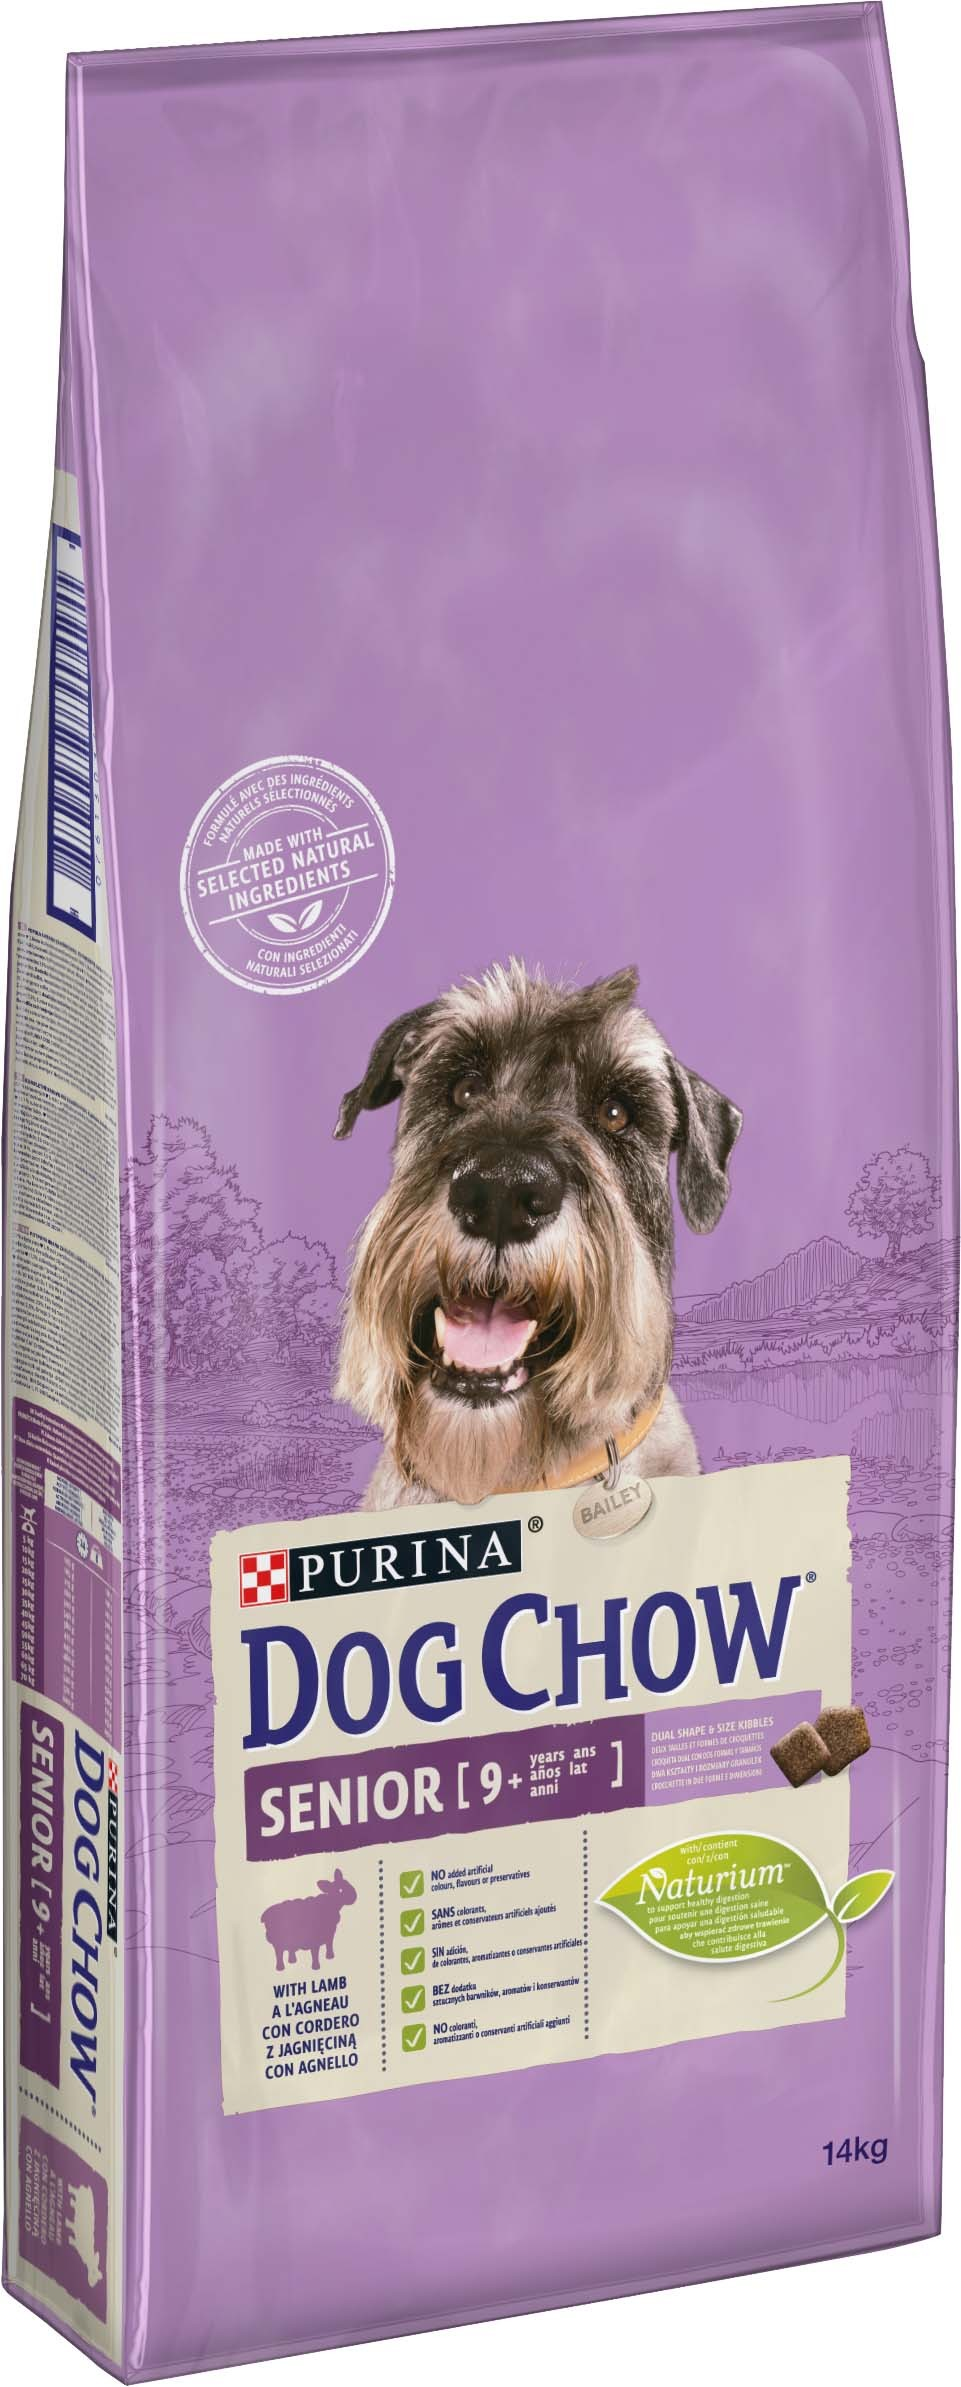 PURINA dog chow SENIOR jehněčí - 14kg